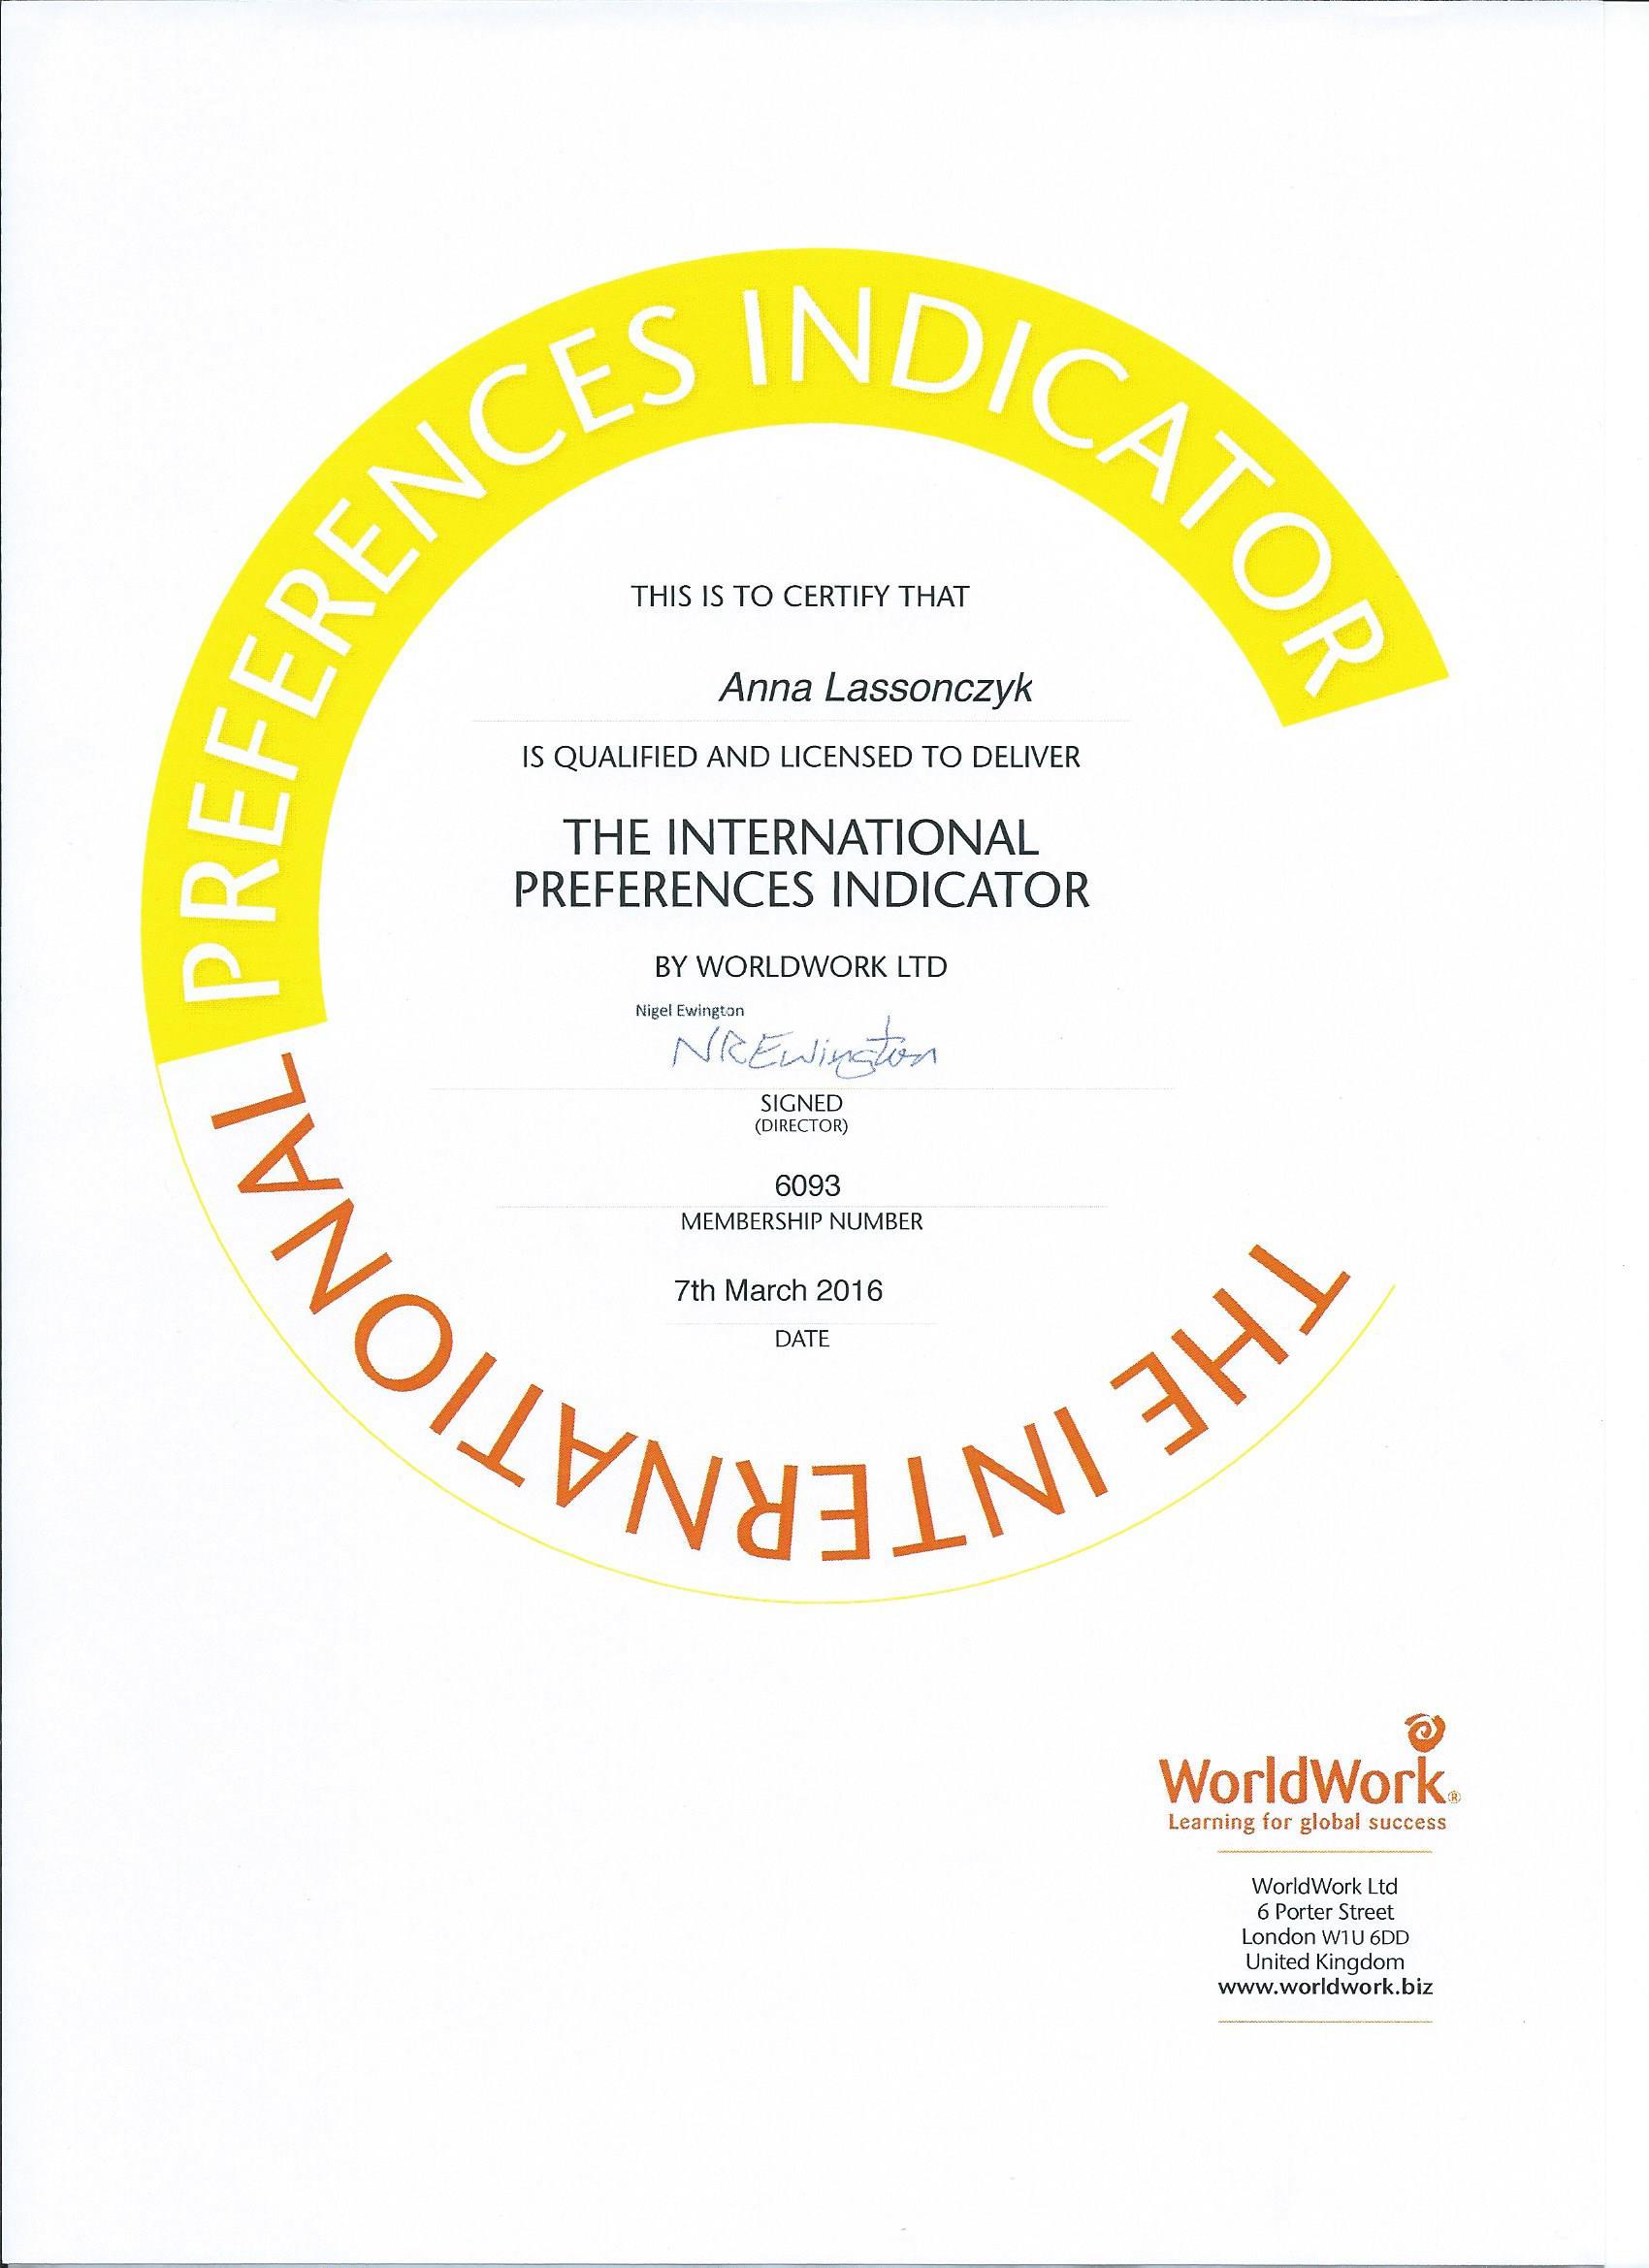 IPI licensed by WorldWokrs